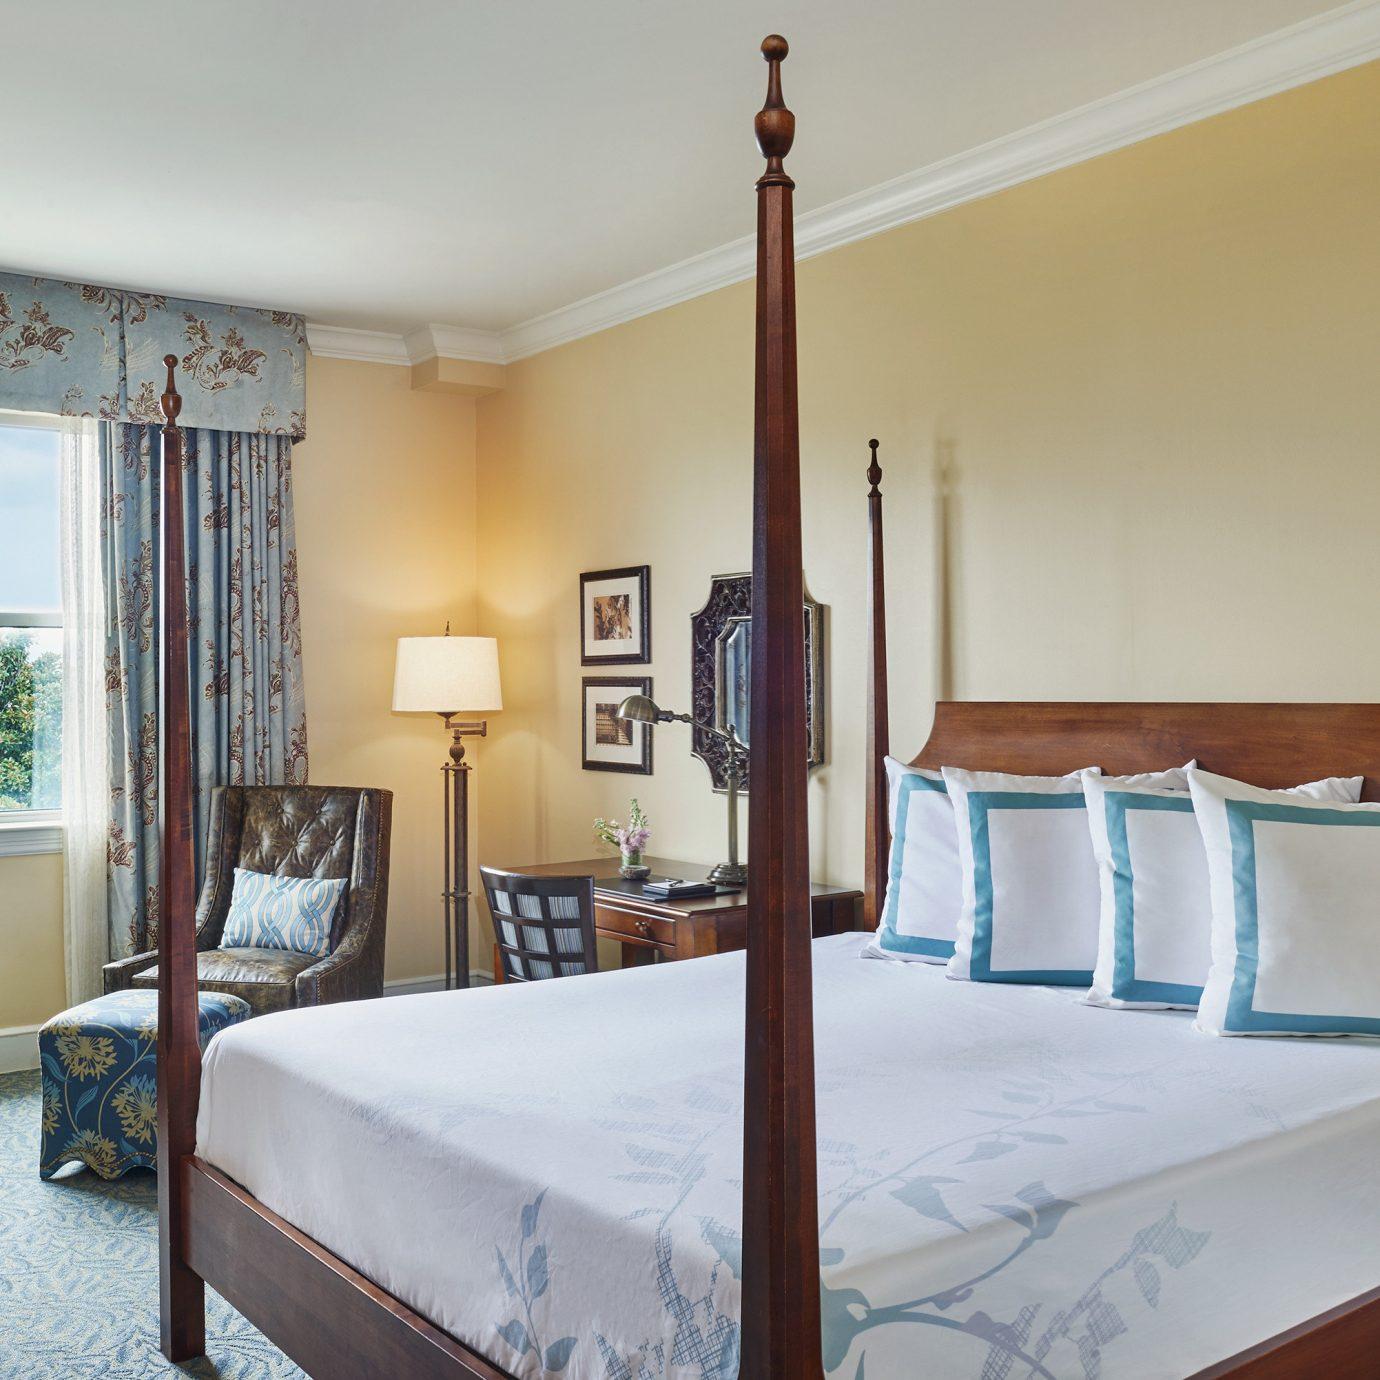 Bedroom Suite bed frame window treatment lamp